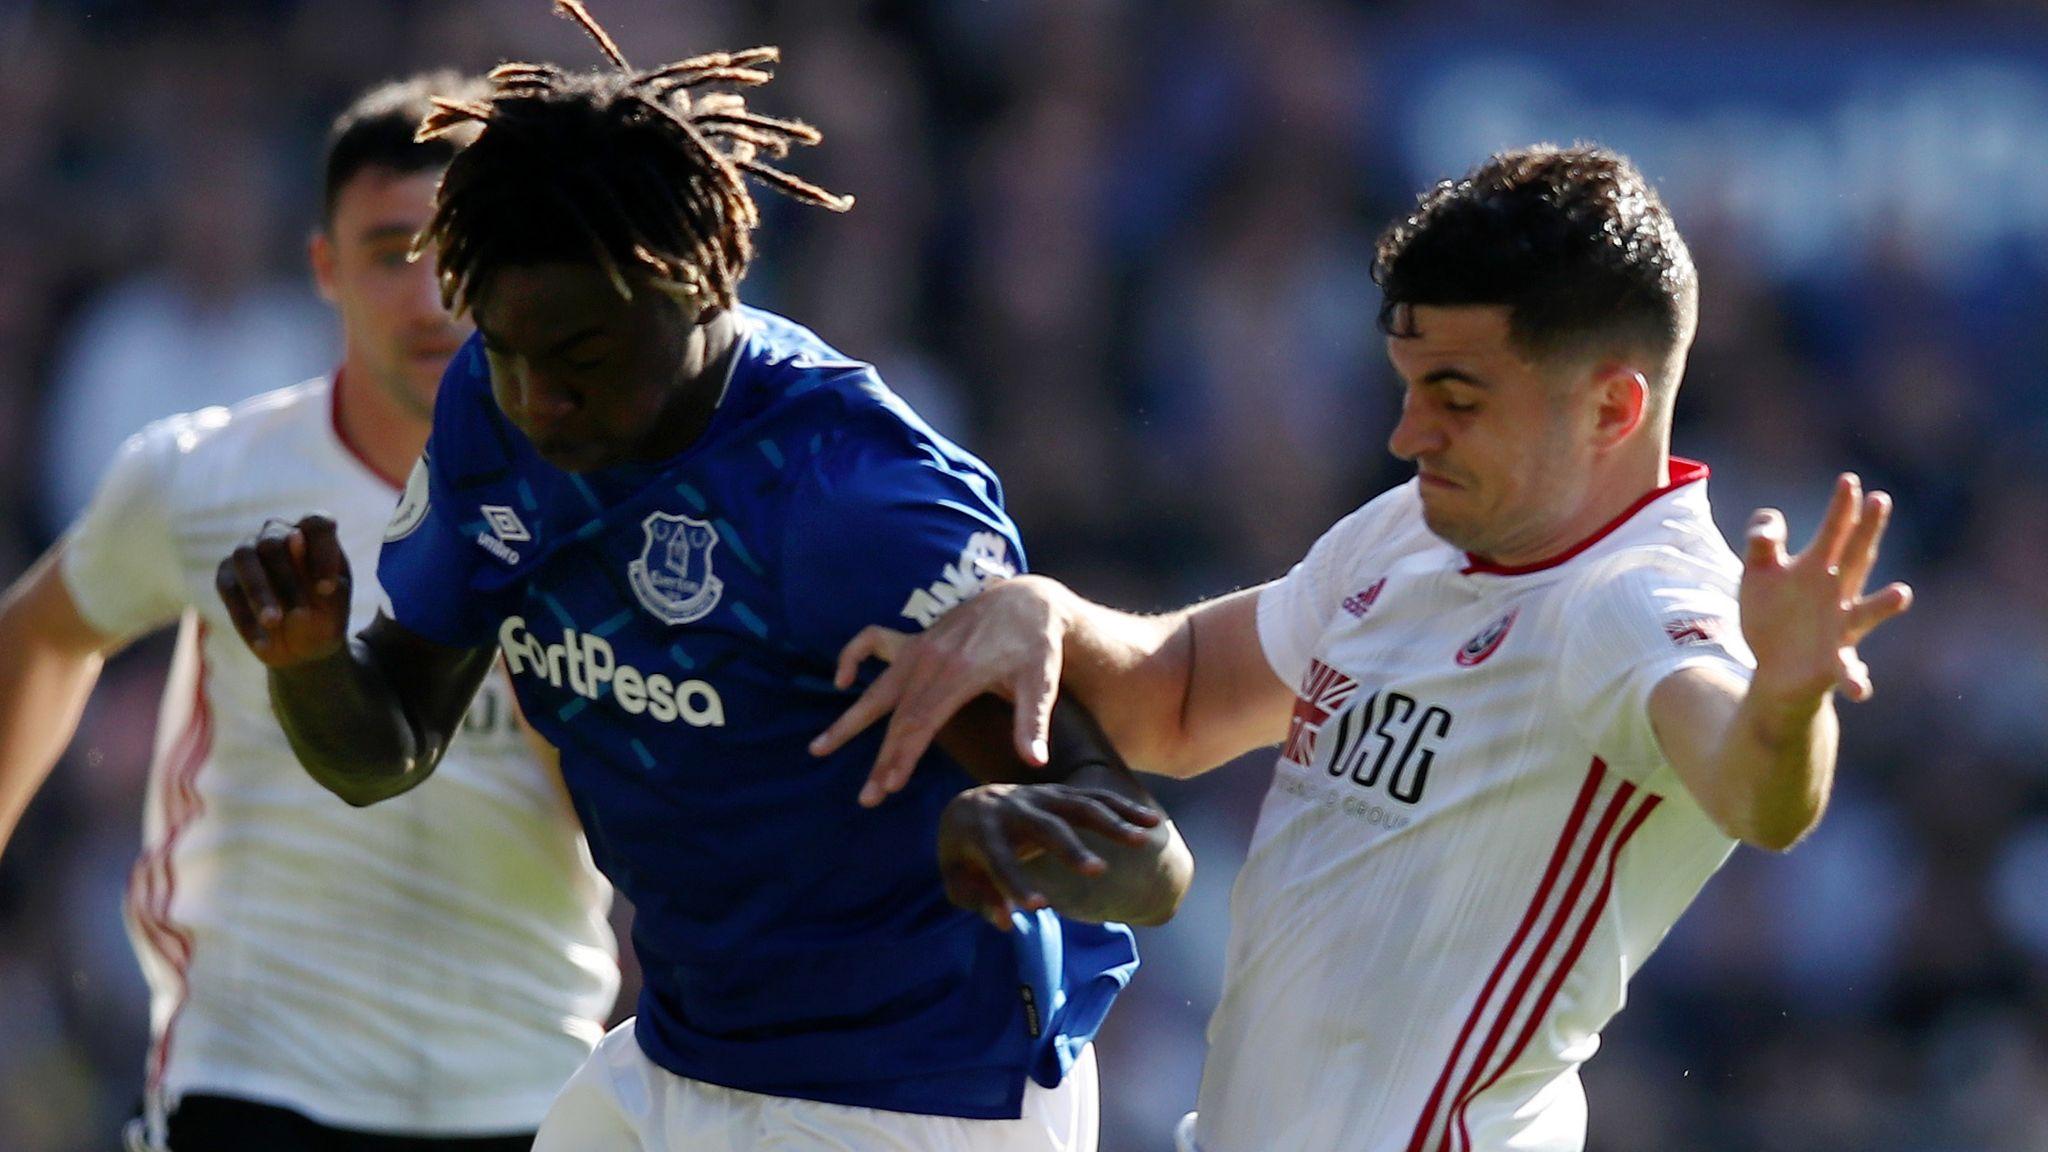 Moise Kean: Everton boss Marco Silva says striker's future is at Goodison Park